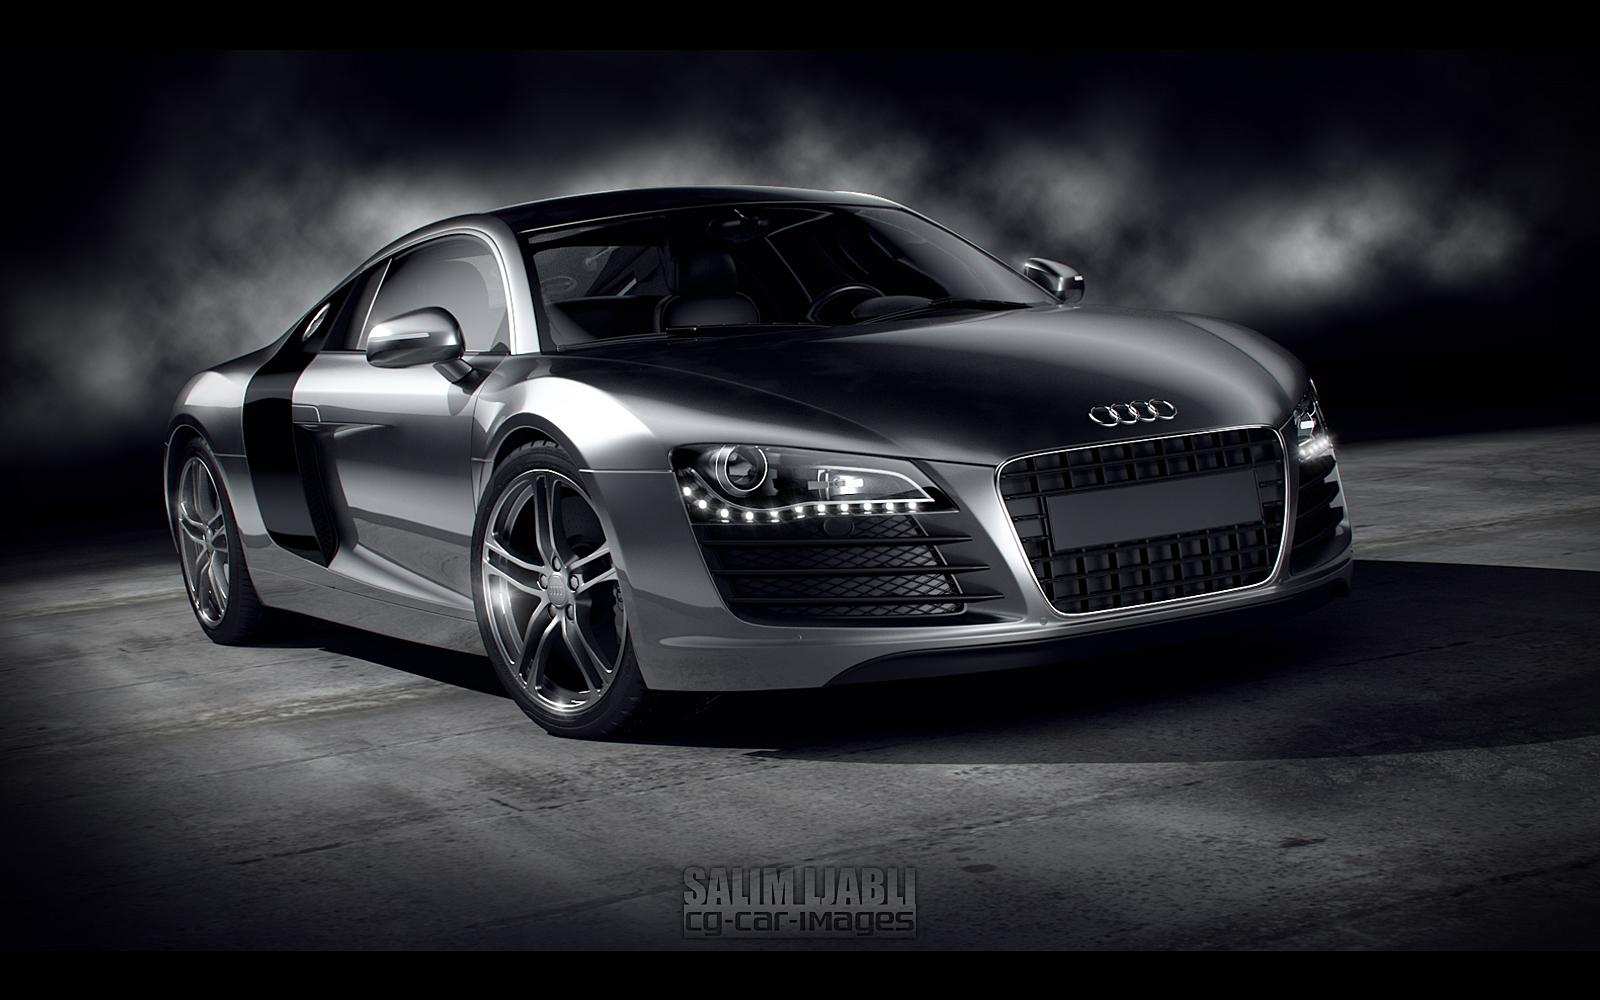 Kelebihan Audi Rt Murah Berkualitas